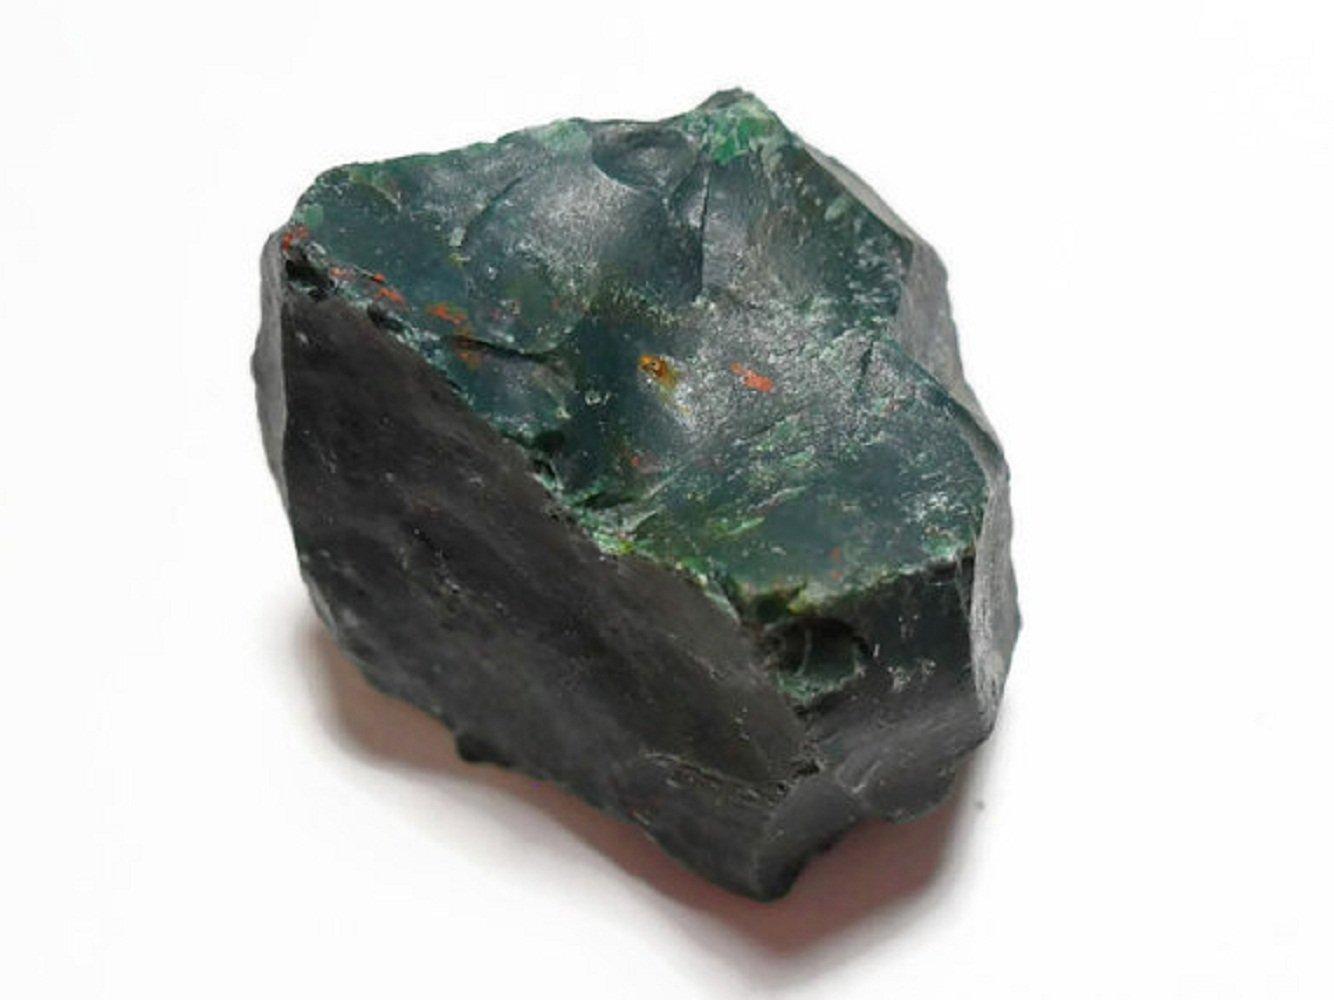 Azaina_wor Collectibles 1000 Carat Lot Bulk Natural Rough Bloodstone Rock Stone (Crystal Healing Raw)